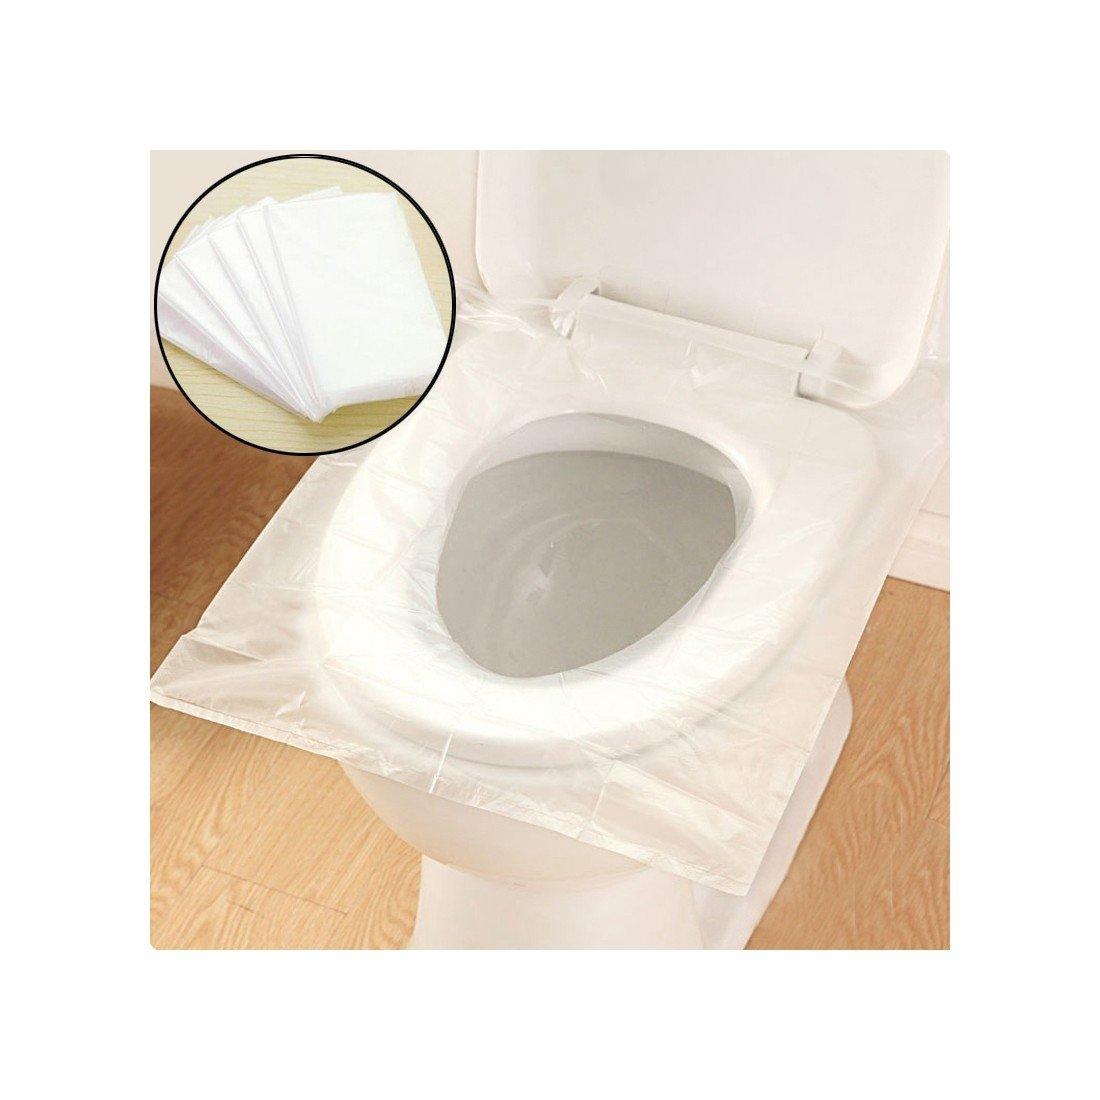 plastic toilet seat covers